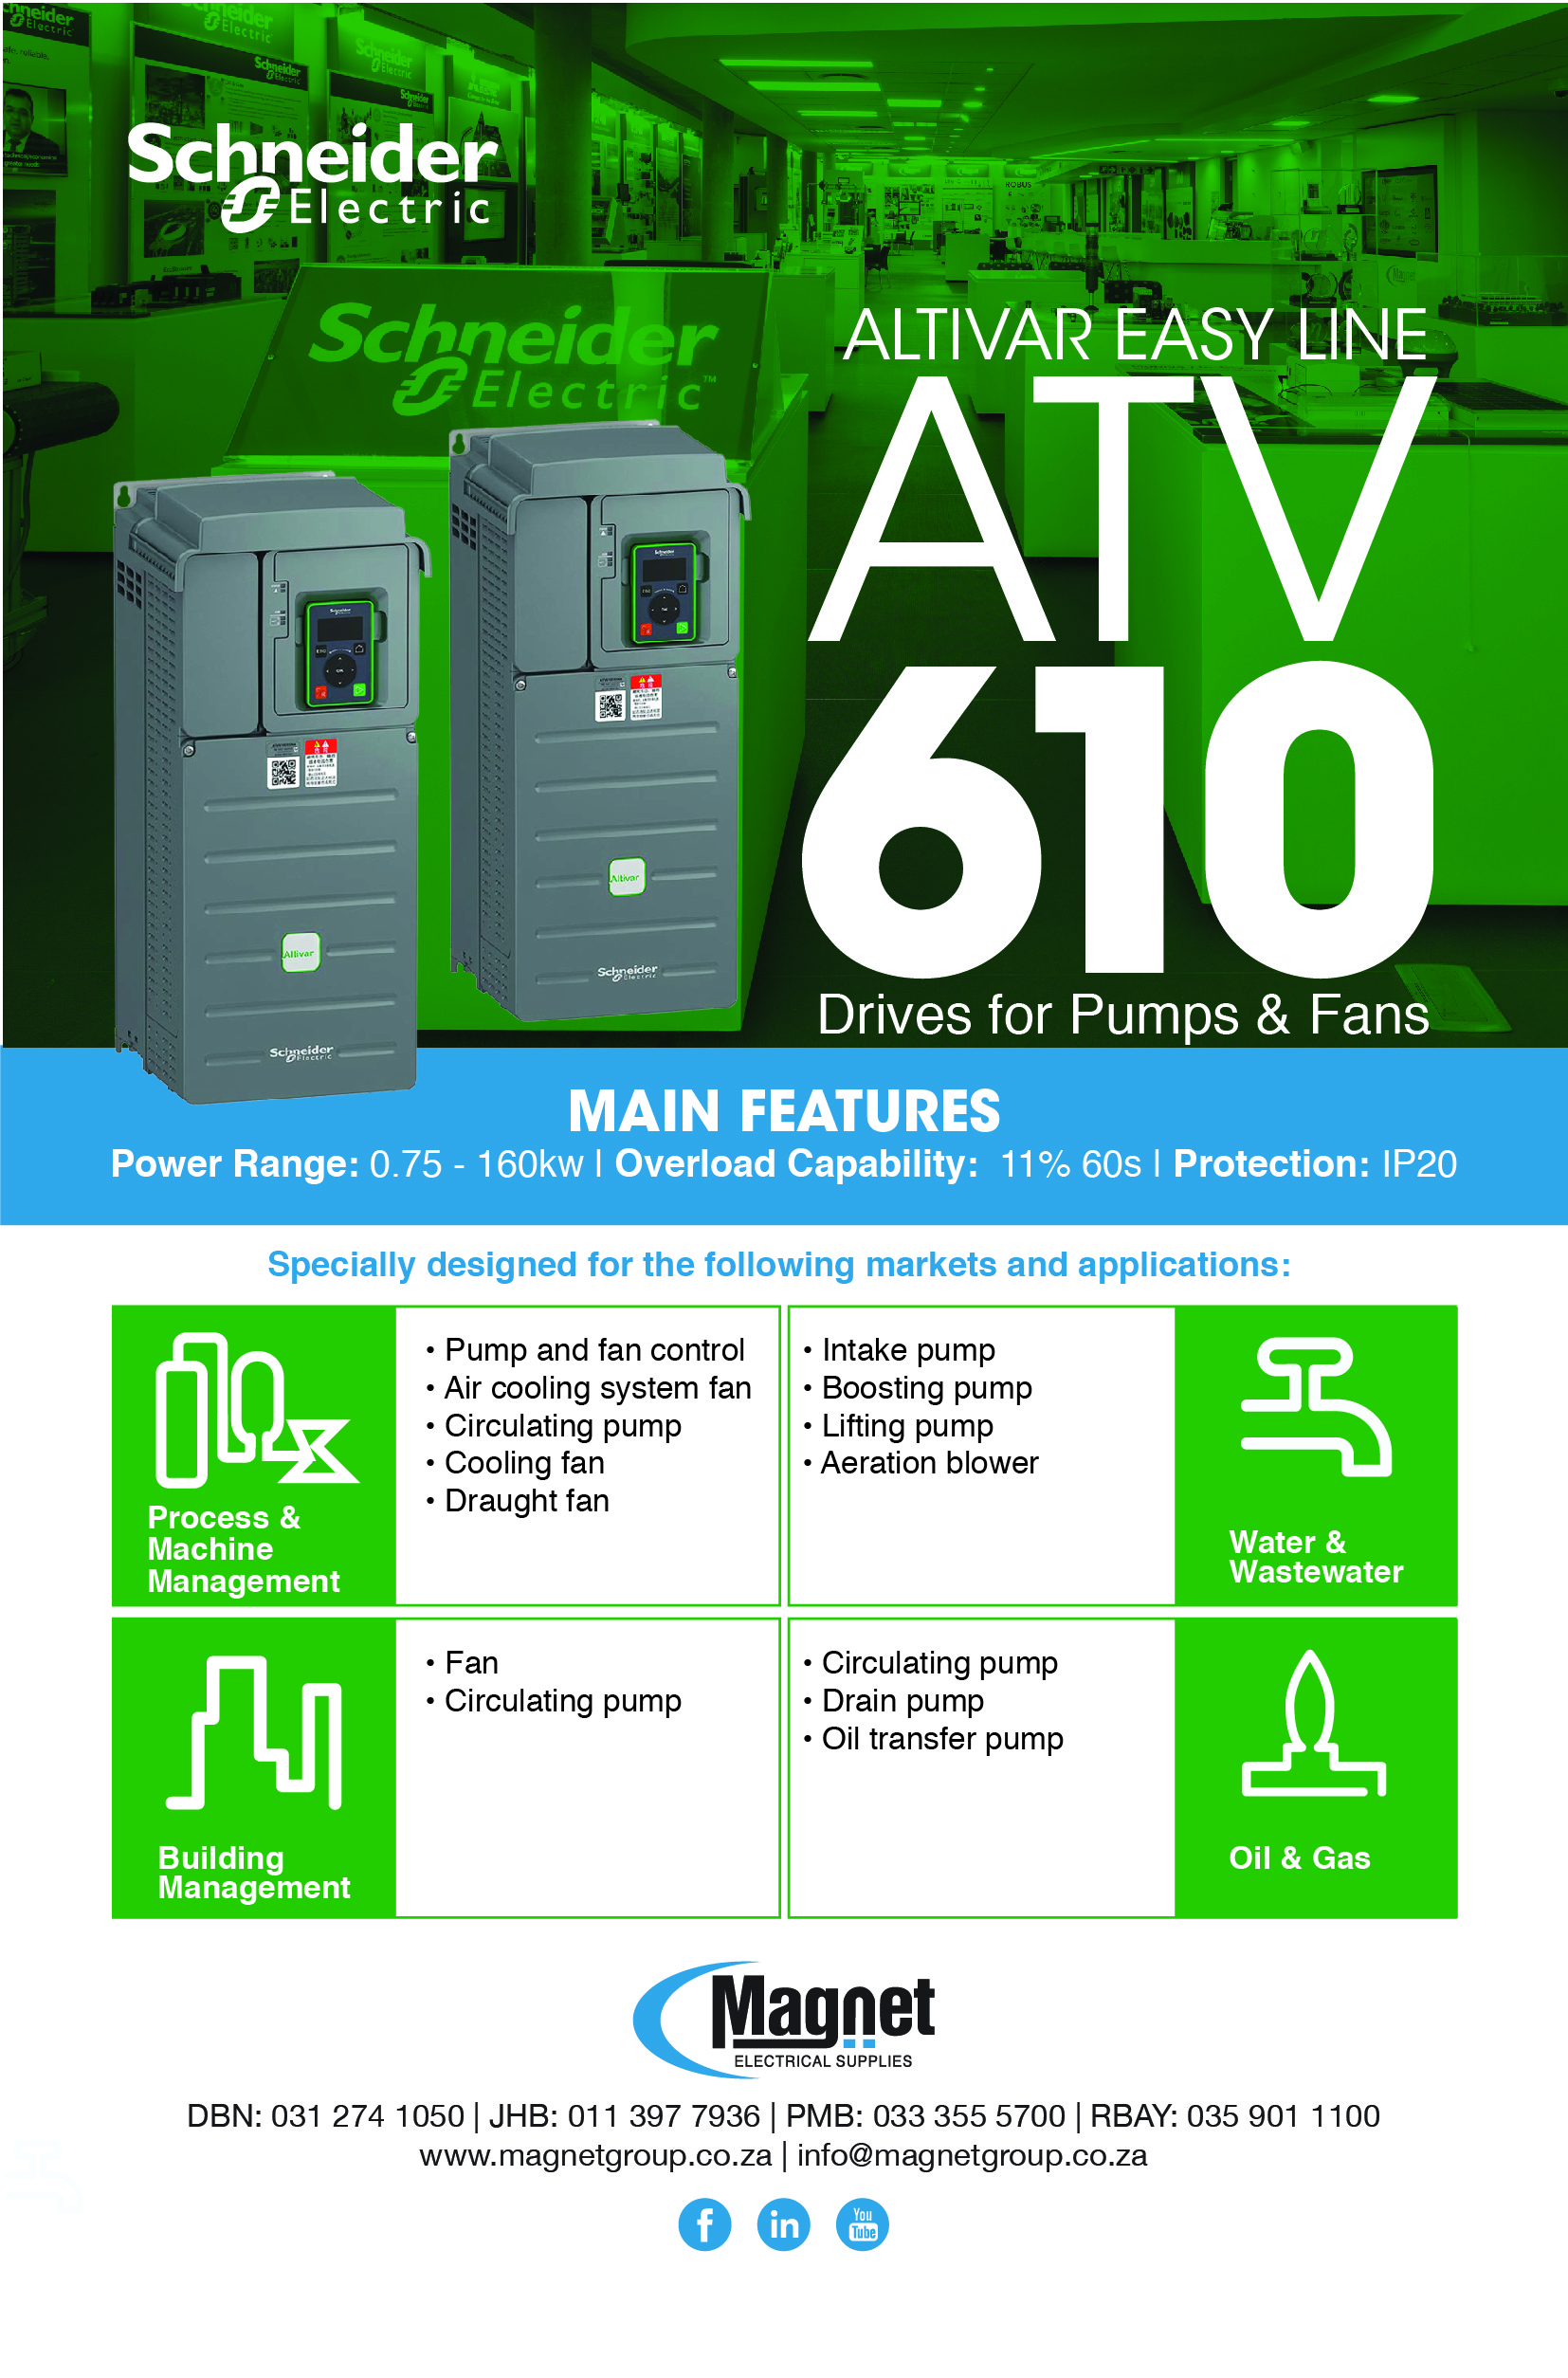 Schneider Electric ALTIVAR Easy Line Range